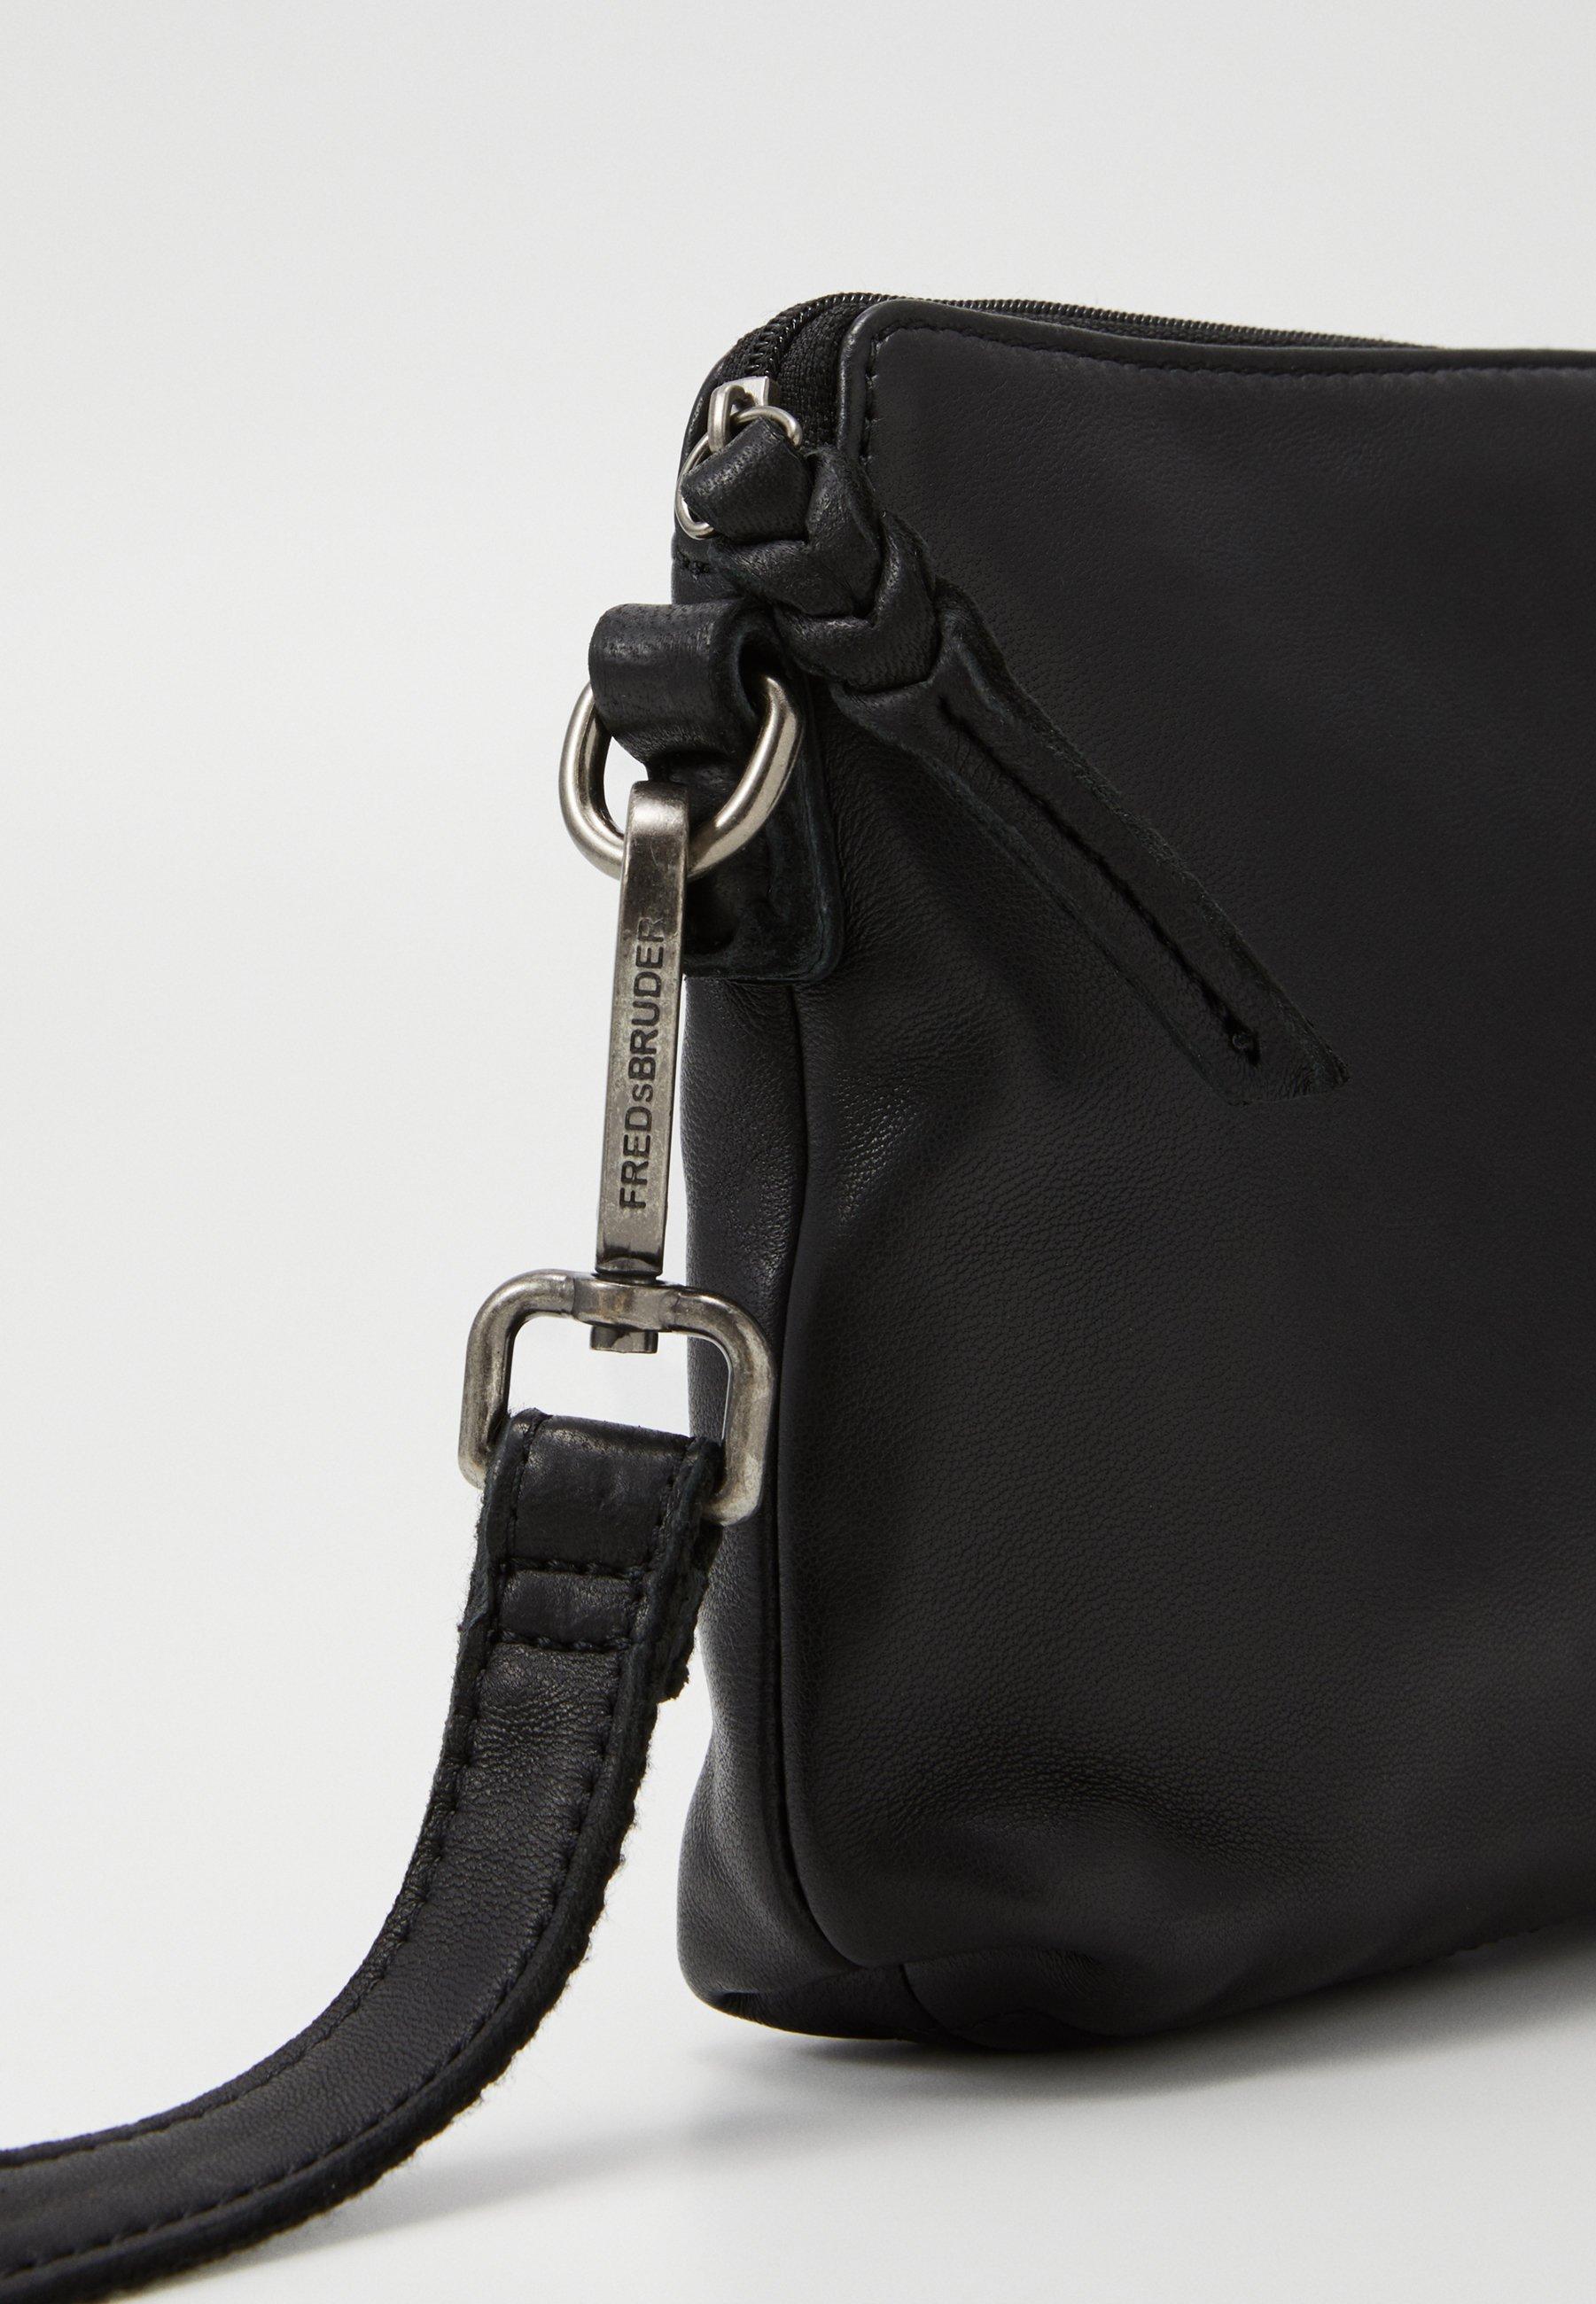 Recommend Fashion Style Accessories FREDsBRUDER SUNNY Across body bag black uZuK9i0HT vZK9GTxbN